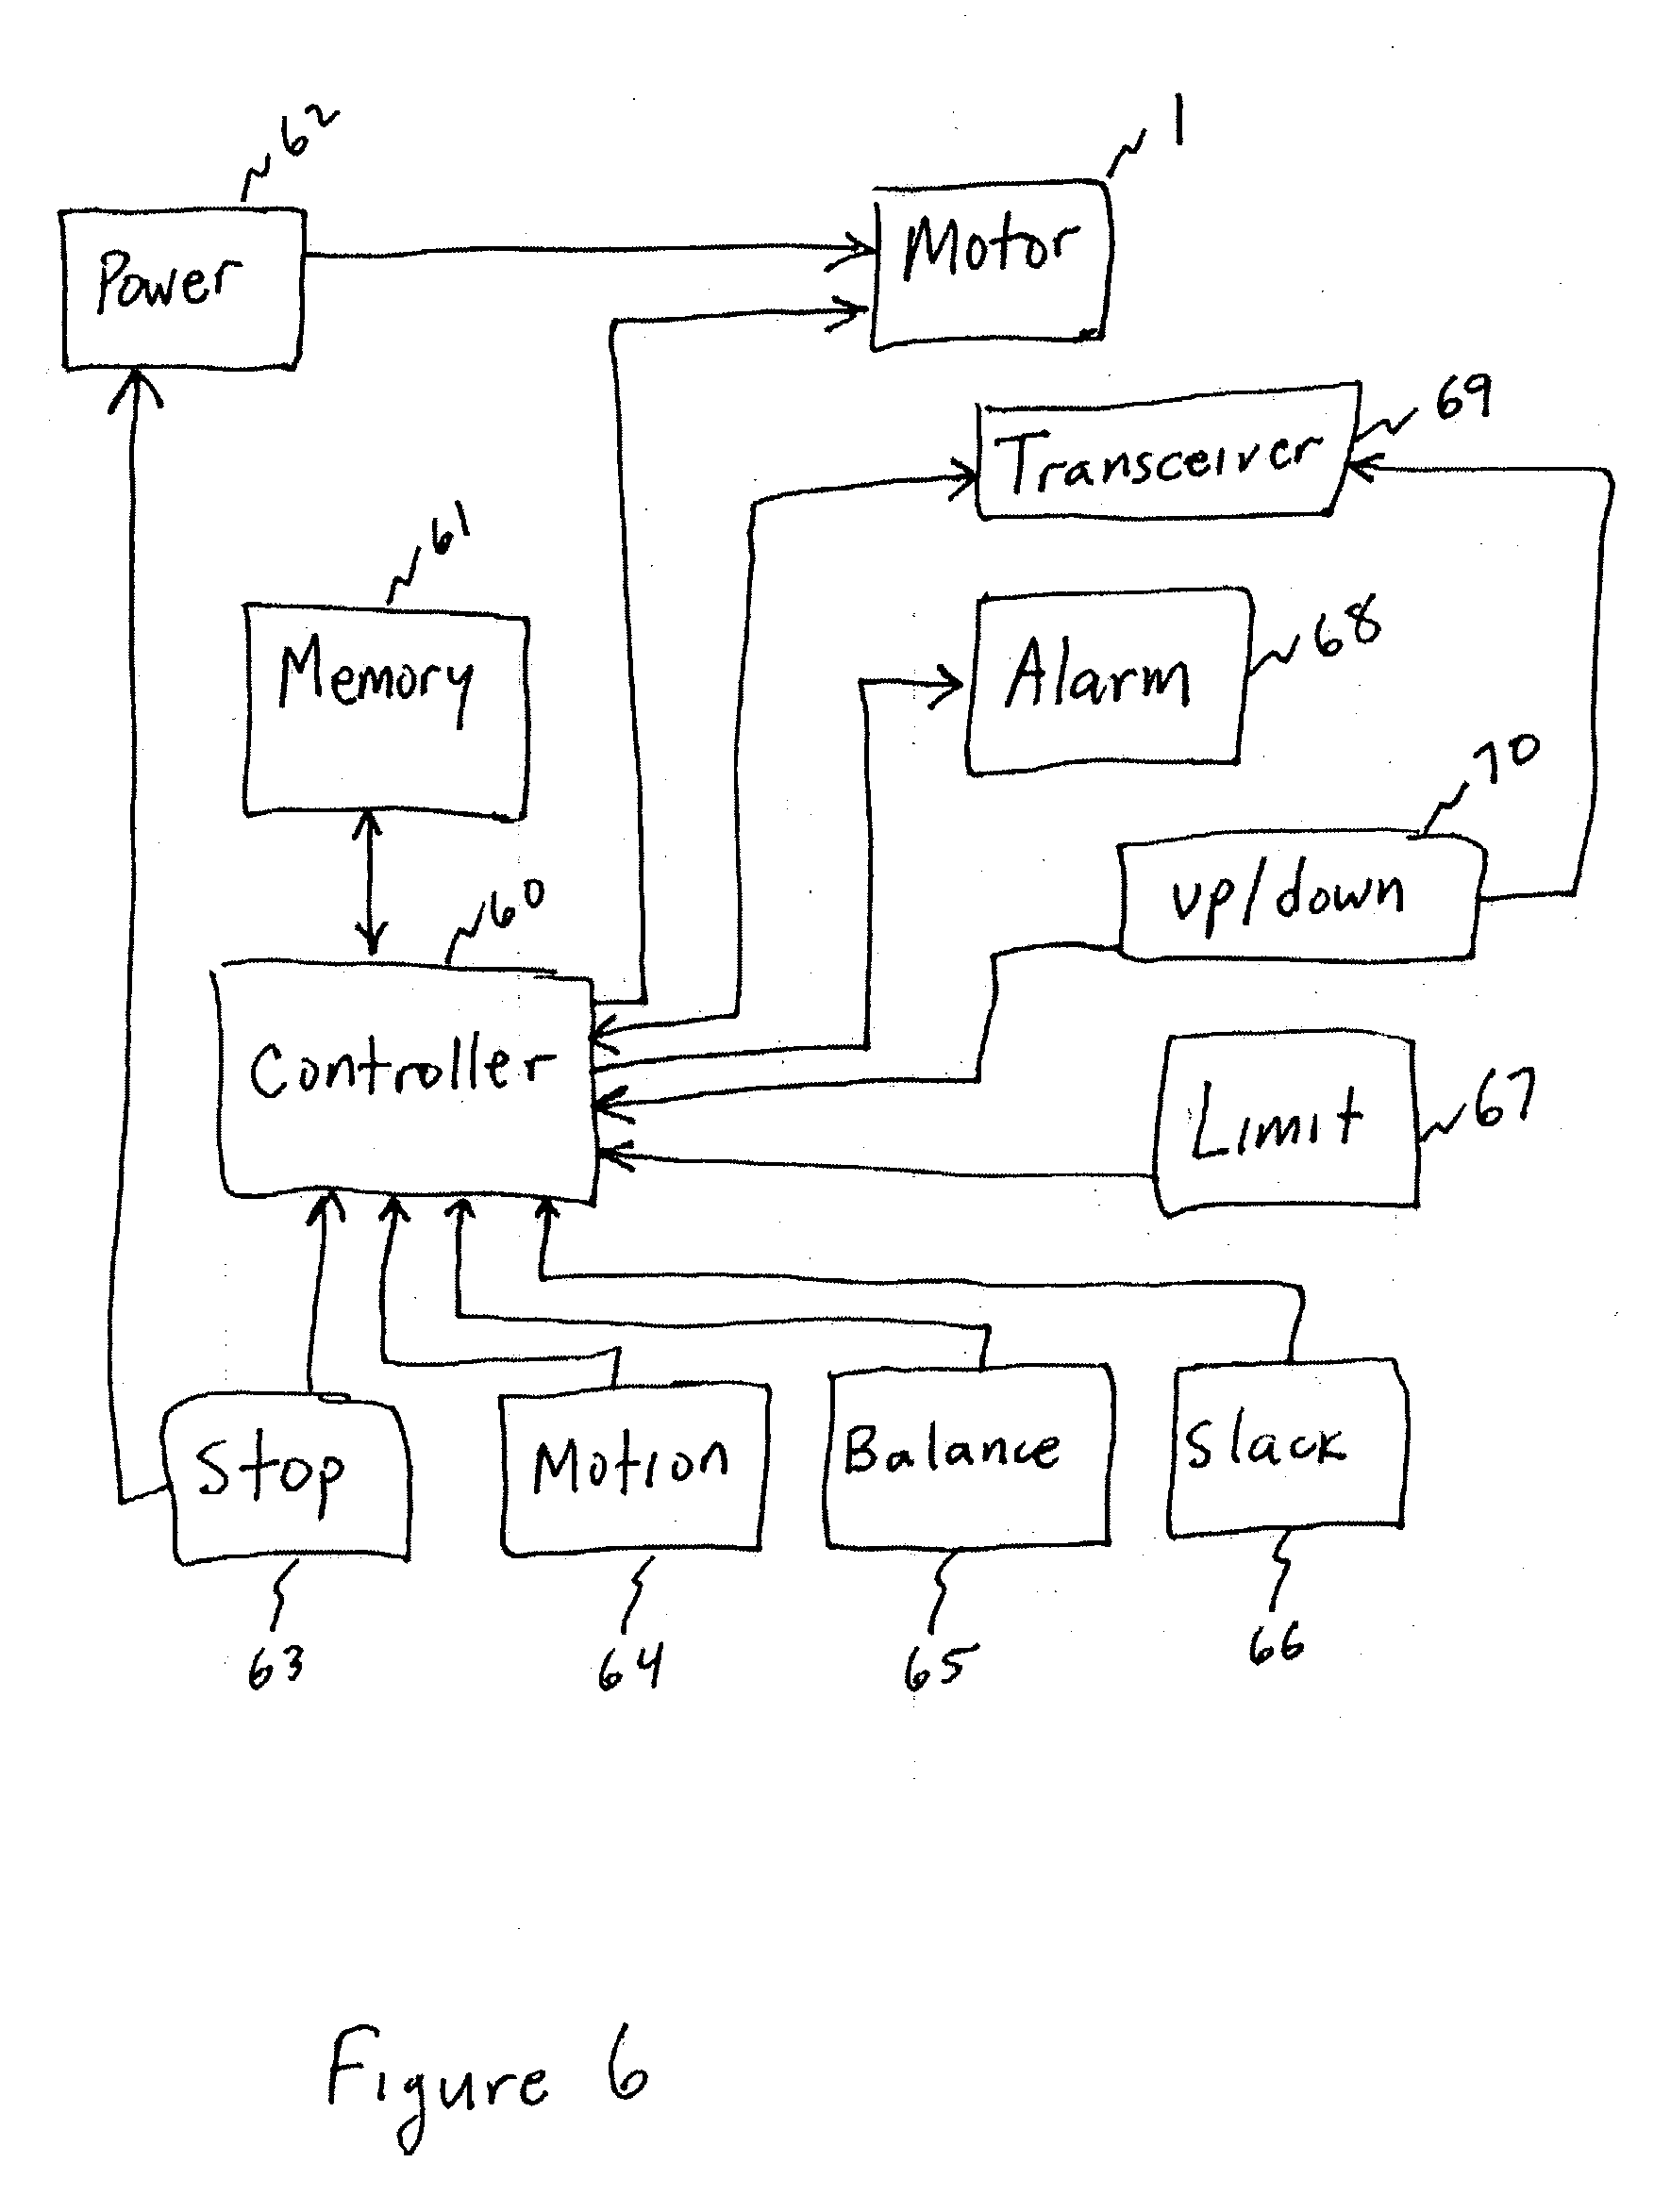 US20040238804A1 20041202 D00006 gfci wiring diagram feed through method,Wiring A Gfci Circuit